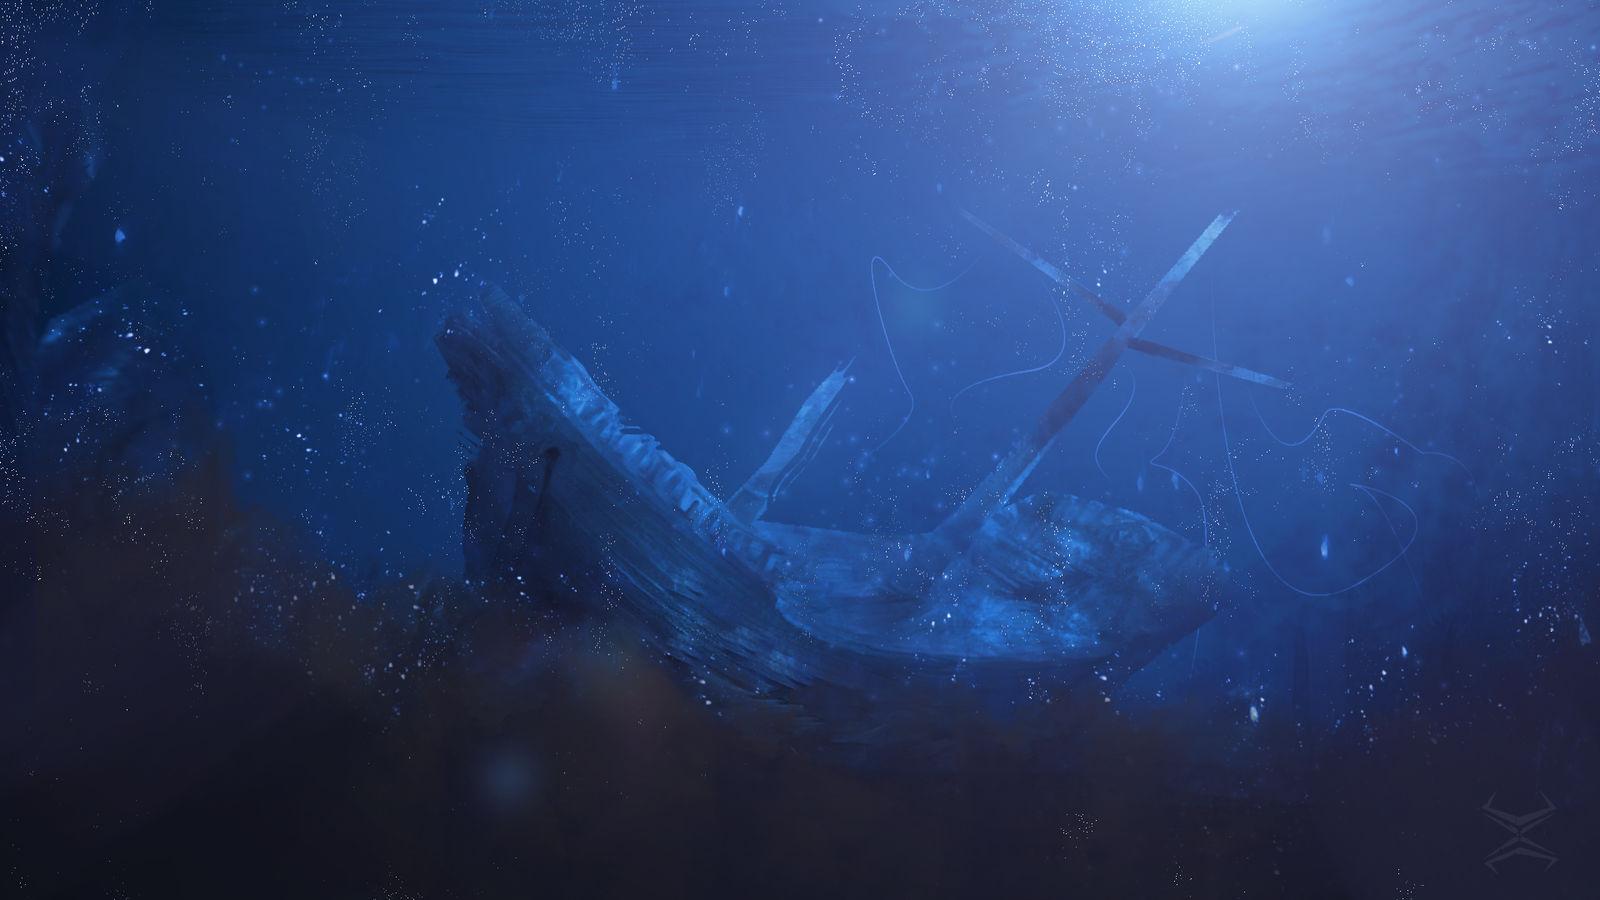 Jolly Roger Bay - Dire Dire Docks ::N64:: by Zaxiade on